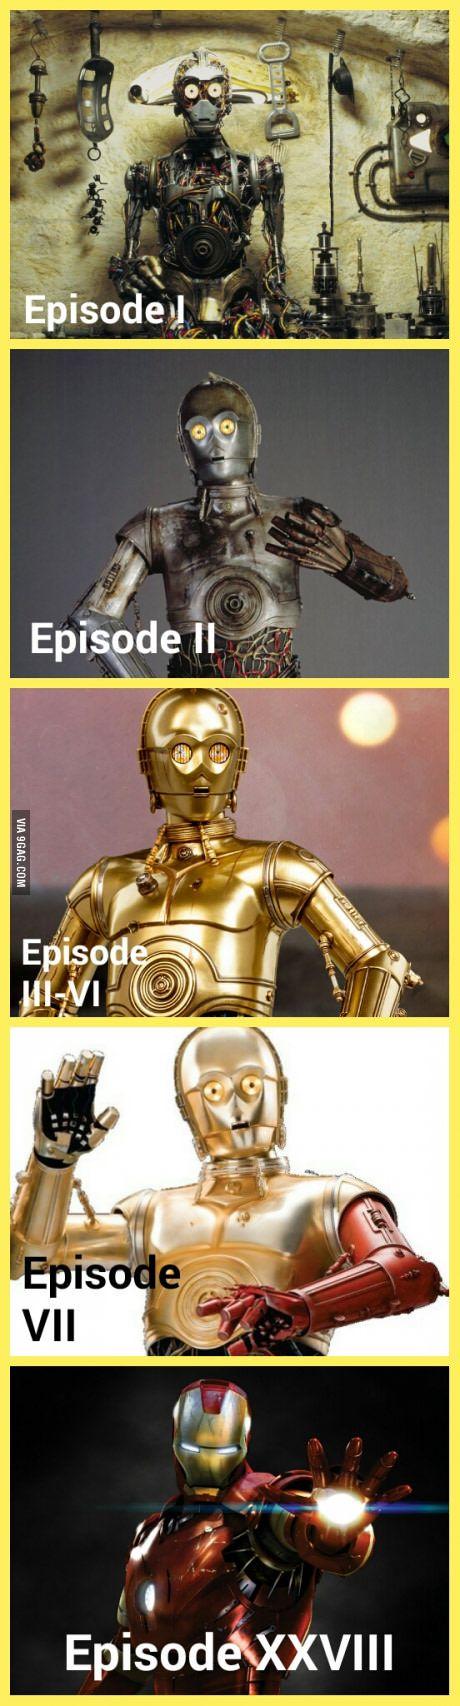 C-3PO evolution, awesome